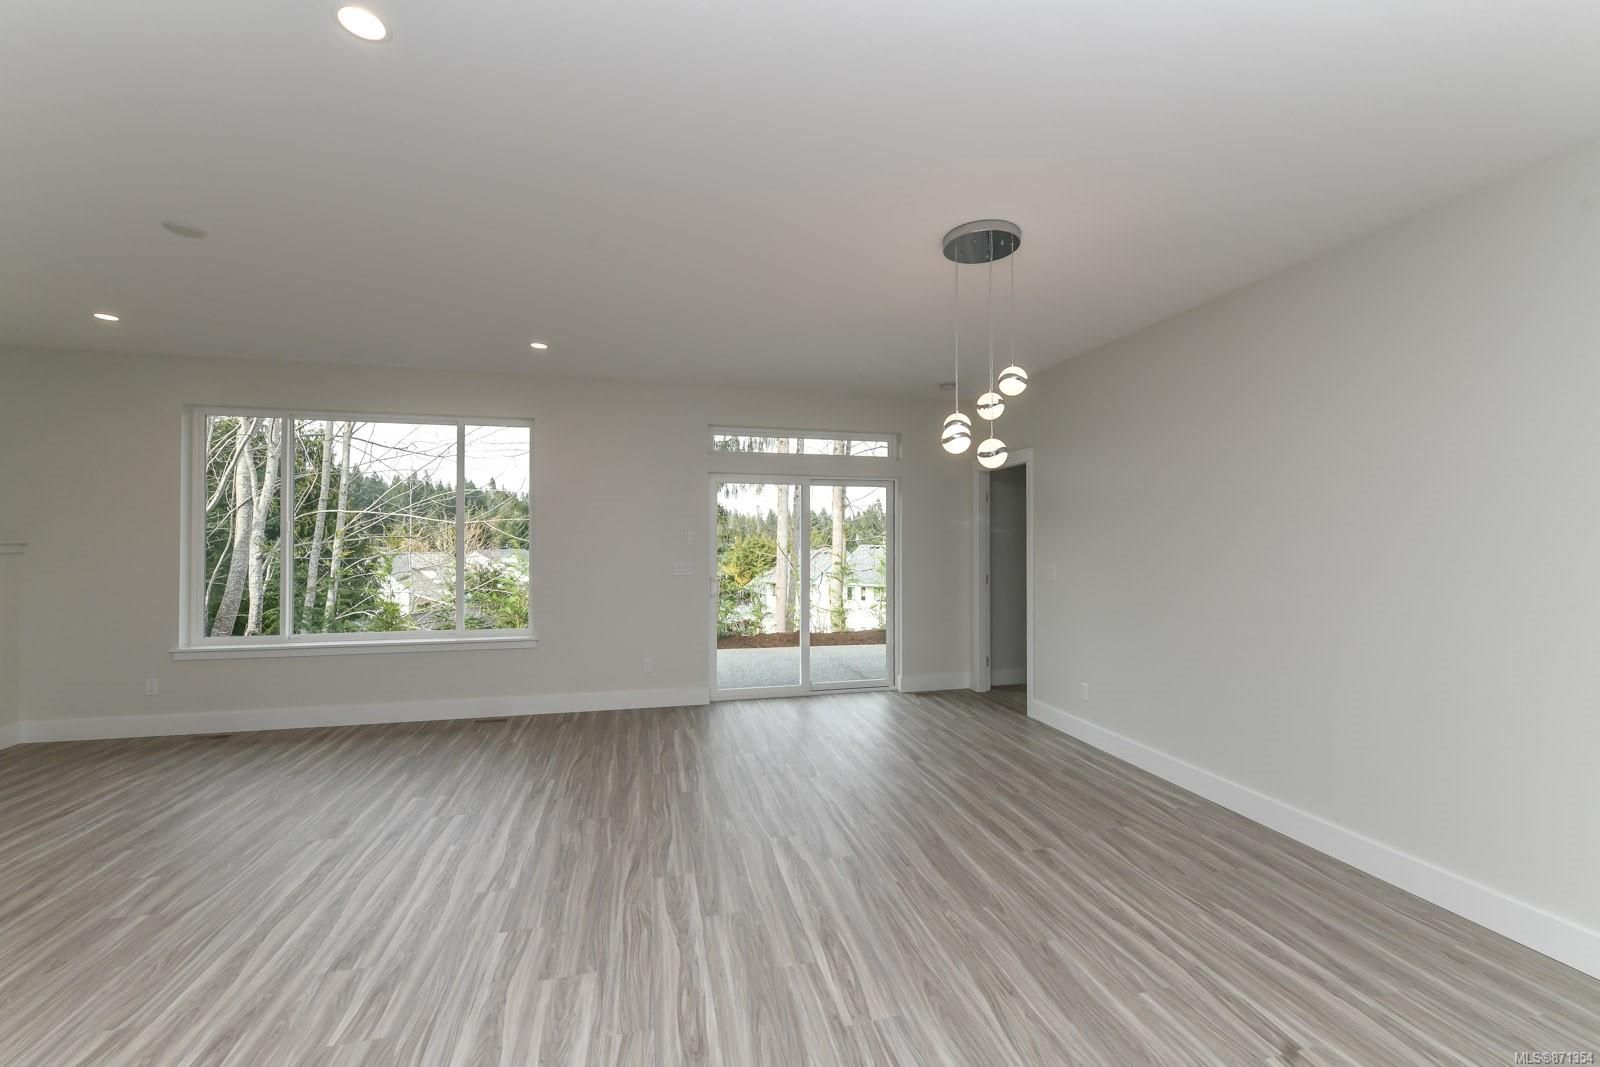 Photo 9: Photos: 68 Grayhawk Pl in : CV Courtenay City House for sale (Comox Valley)  : MLS®# 871354